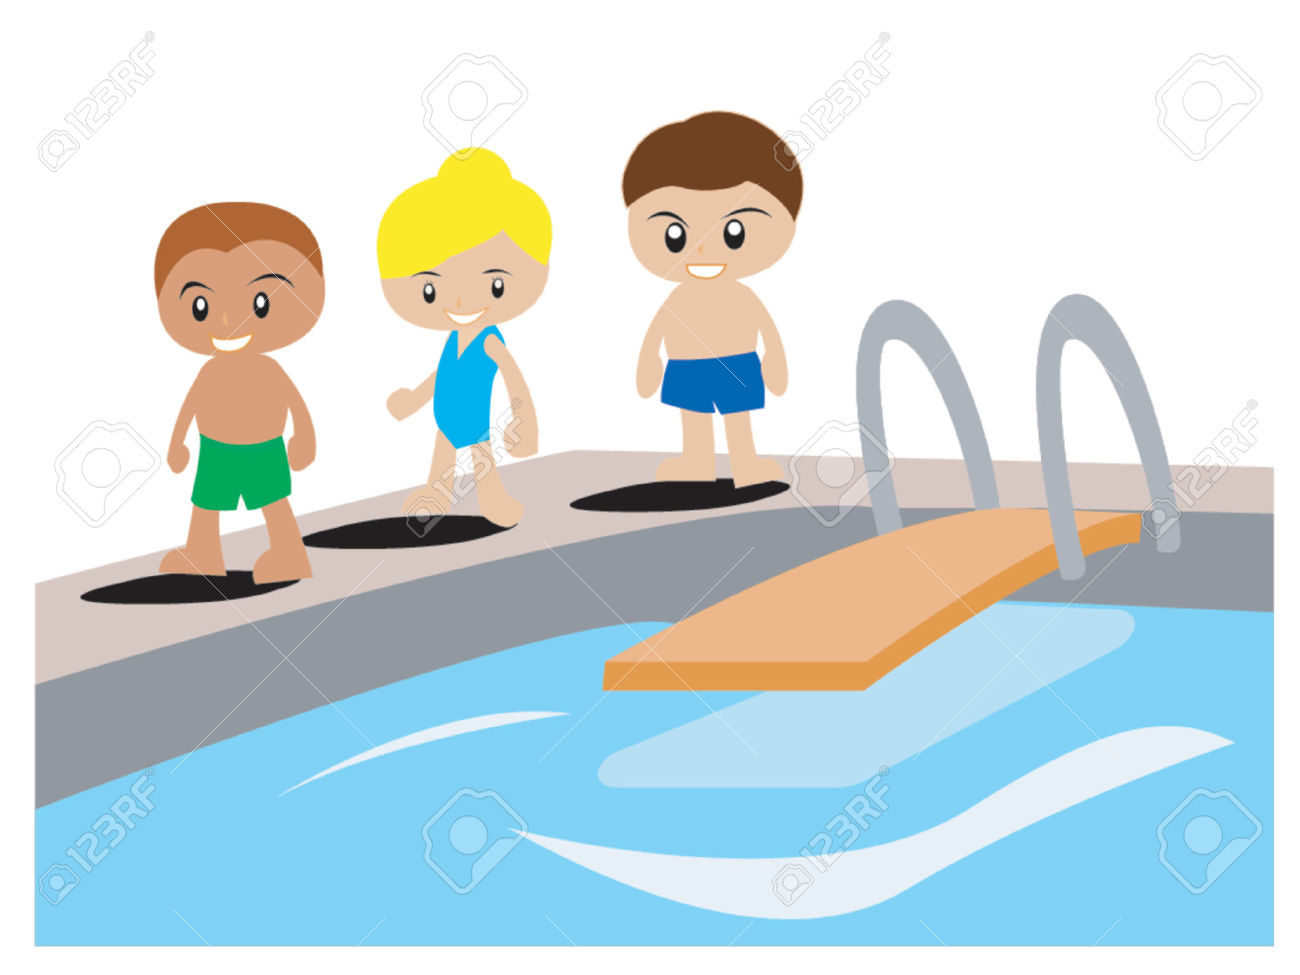 Boys swimming pool clipart-Boys swimming pool clipart-3